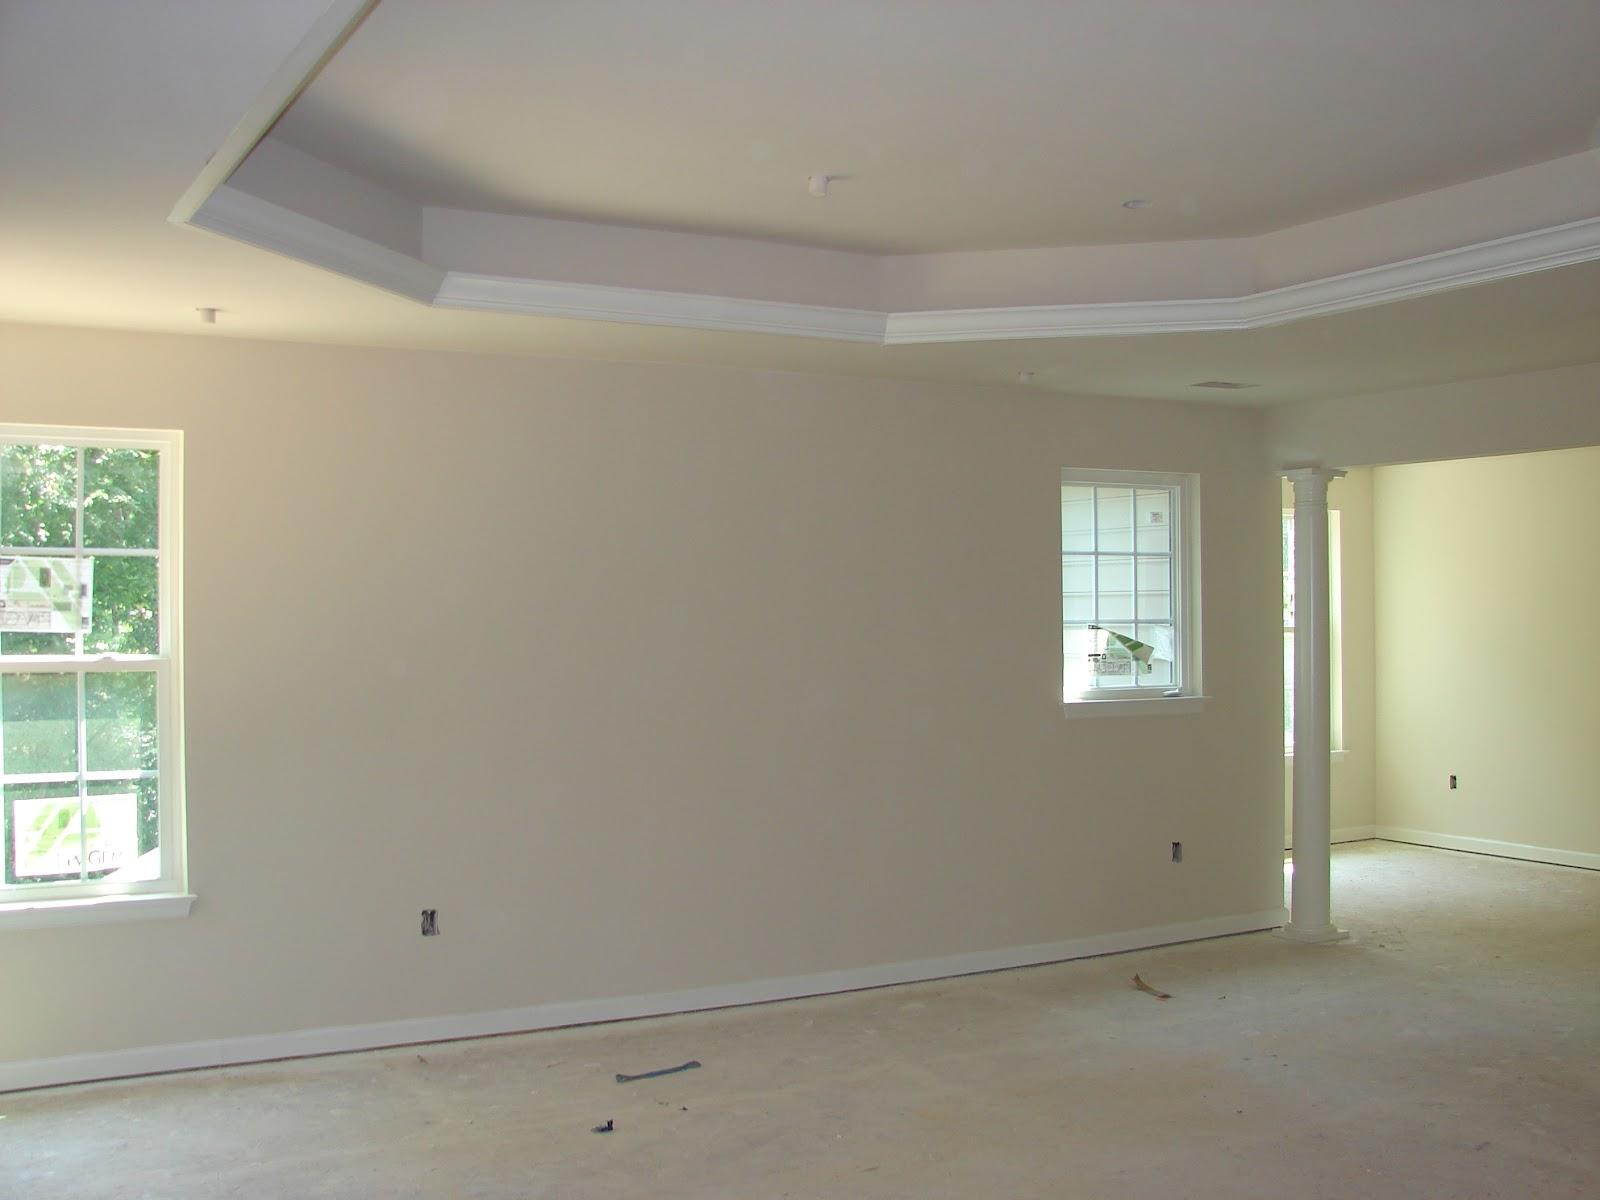 Building A Ryan Home Avalon Granite Trim Paint Amp Tons